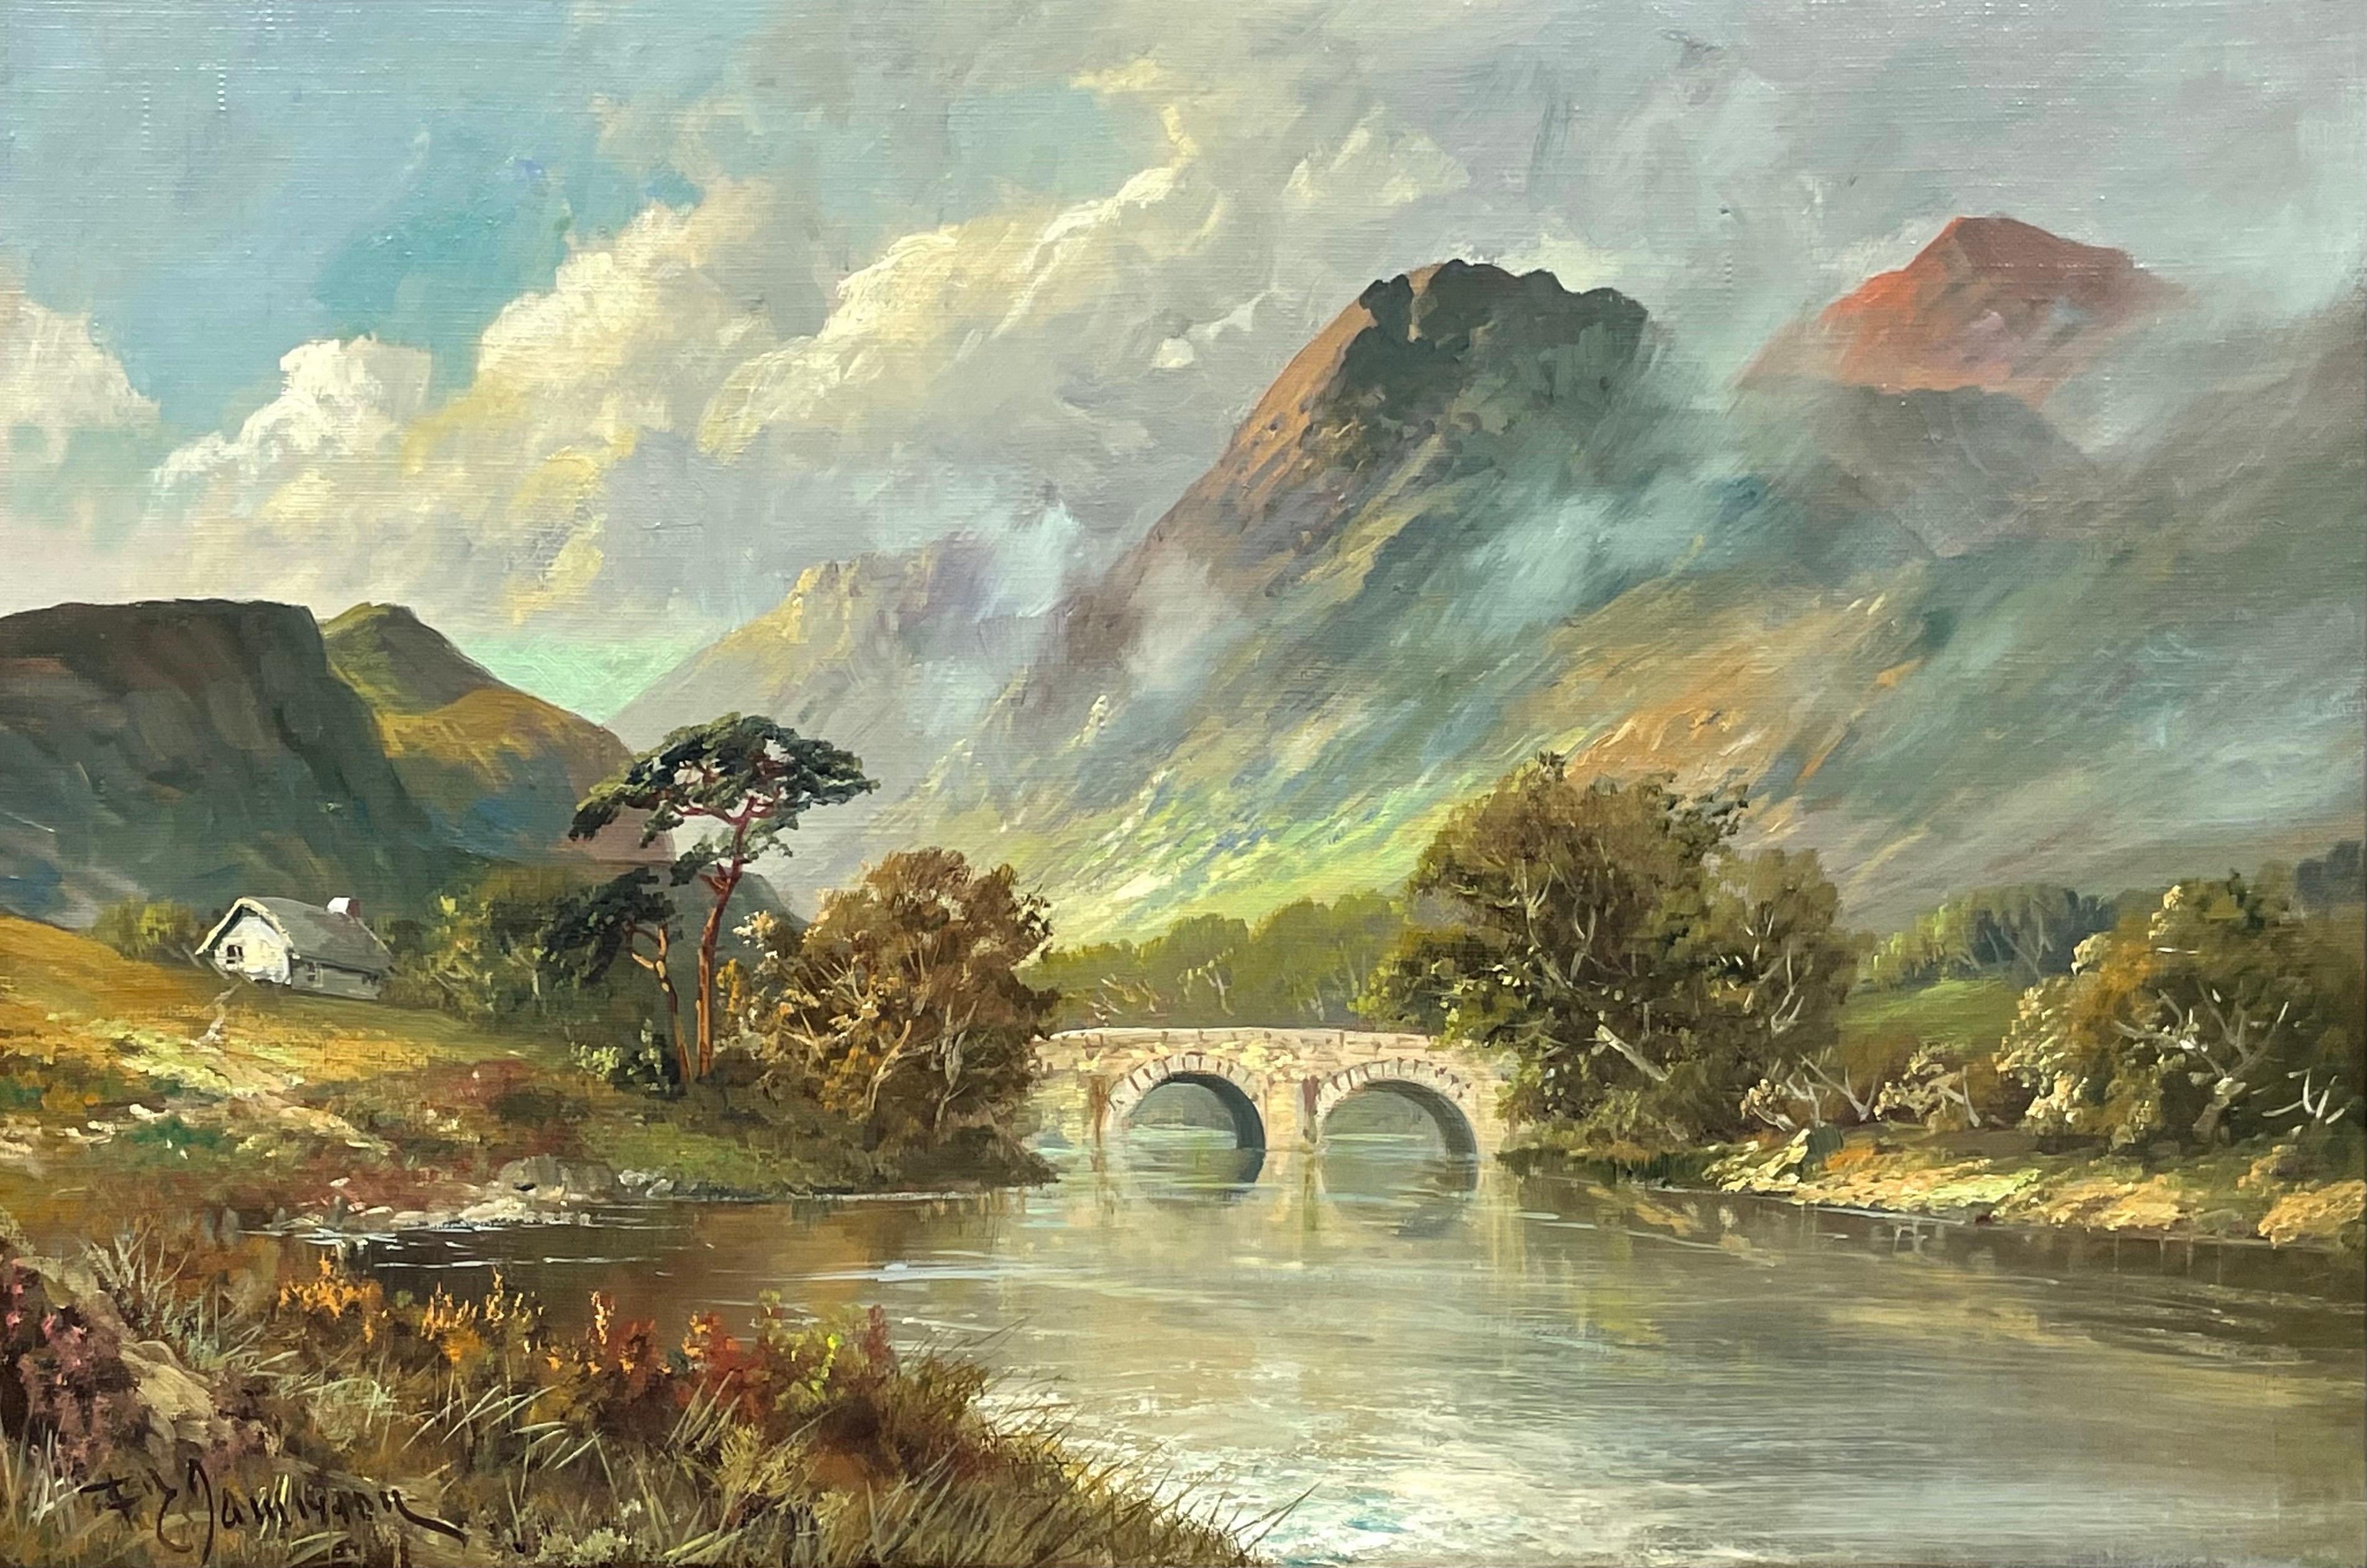 Antique Scottish Highlands Oil Painting River & Mountains Old Stone Bridge